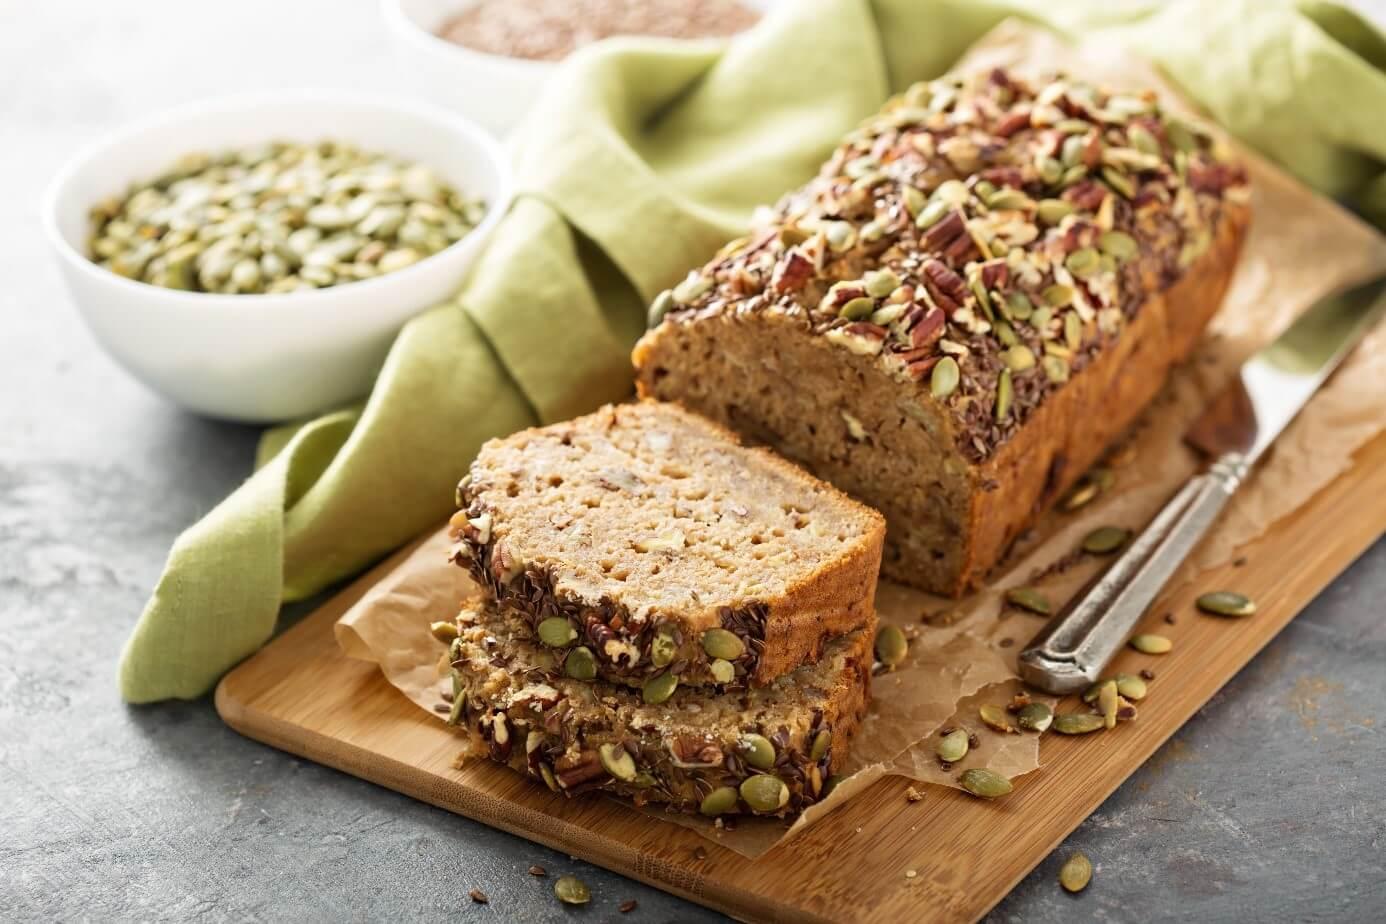 Prawdziwy domowy chleb